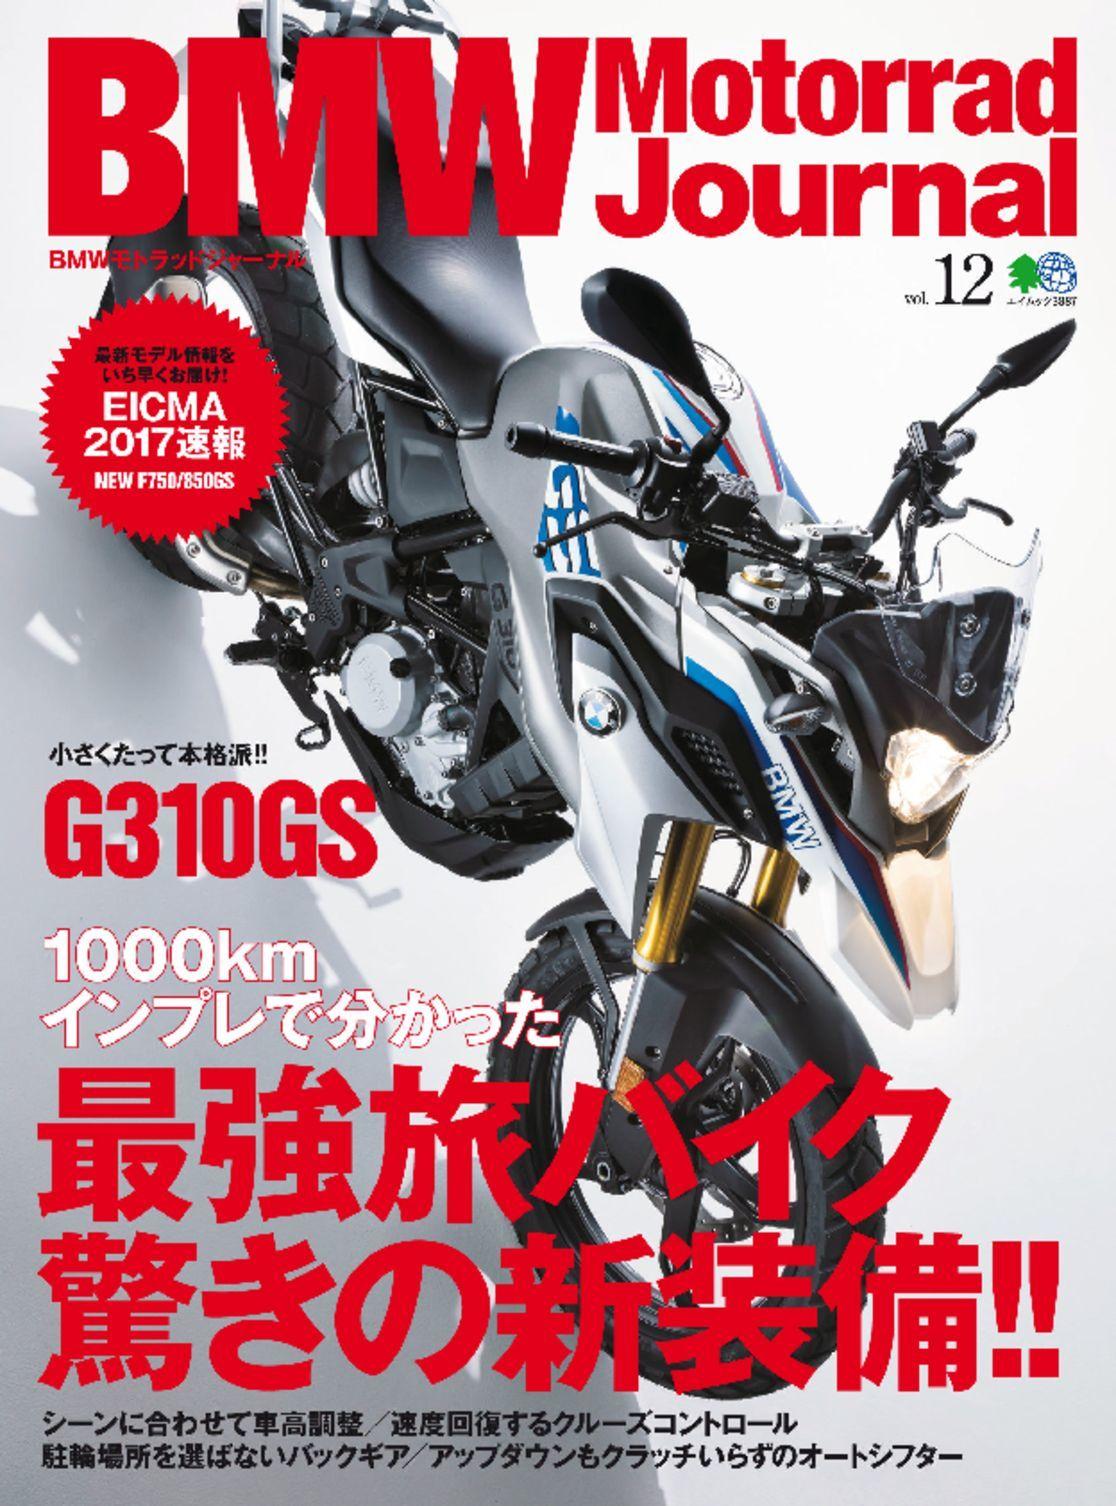 Bmw Motorrad Journal bmw Boxer Journal Digital